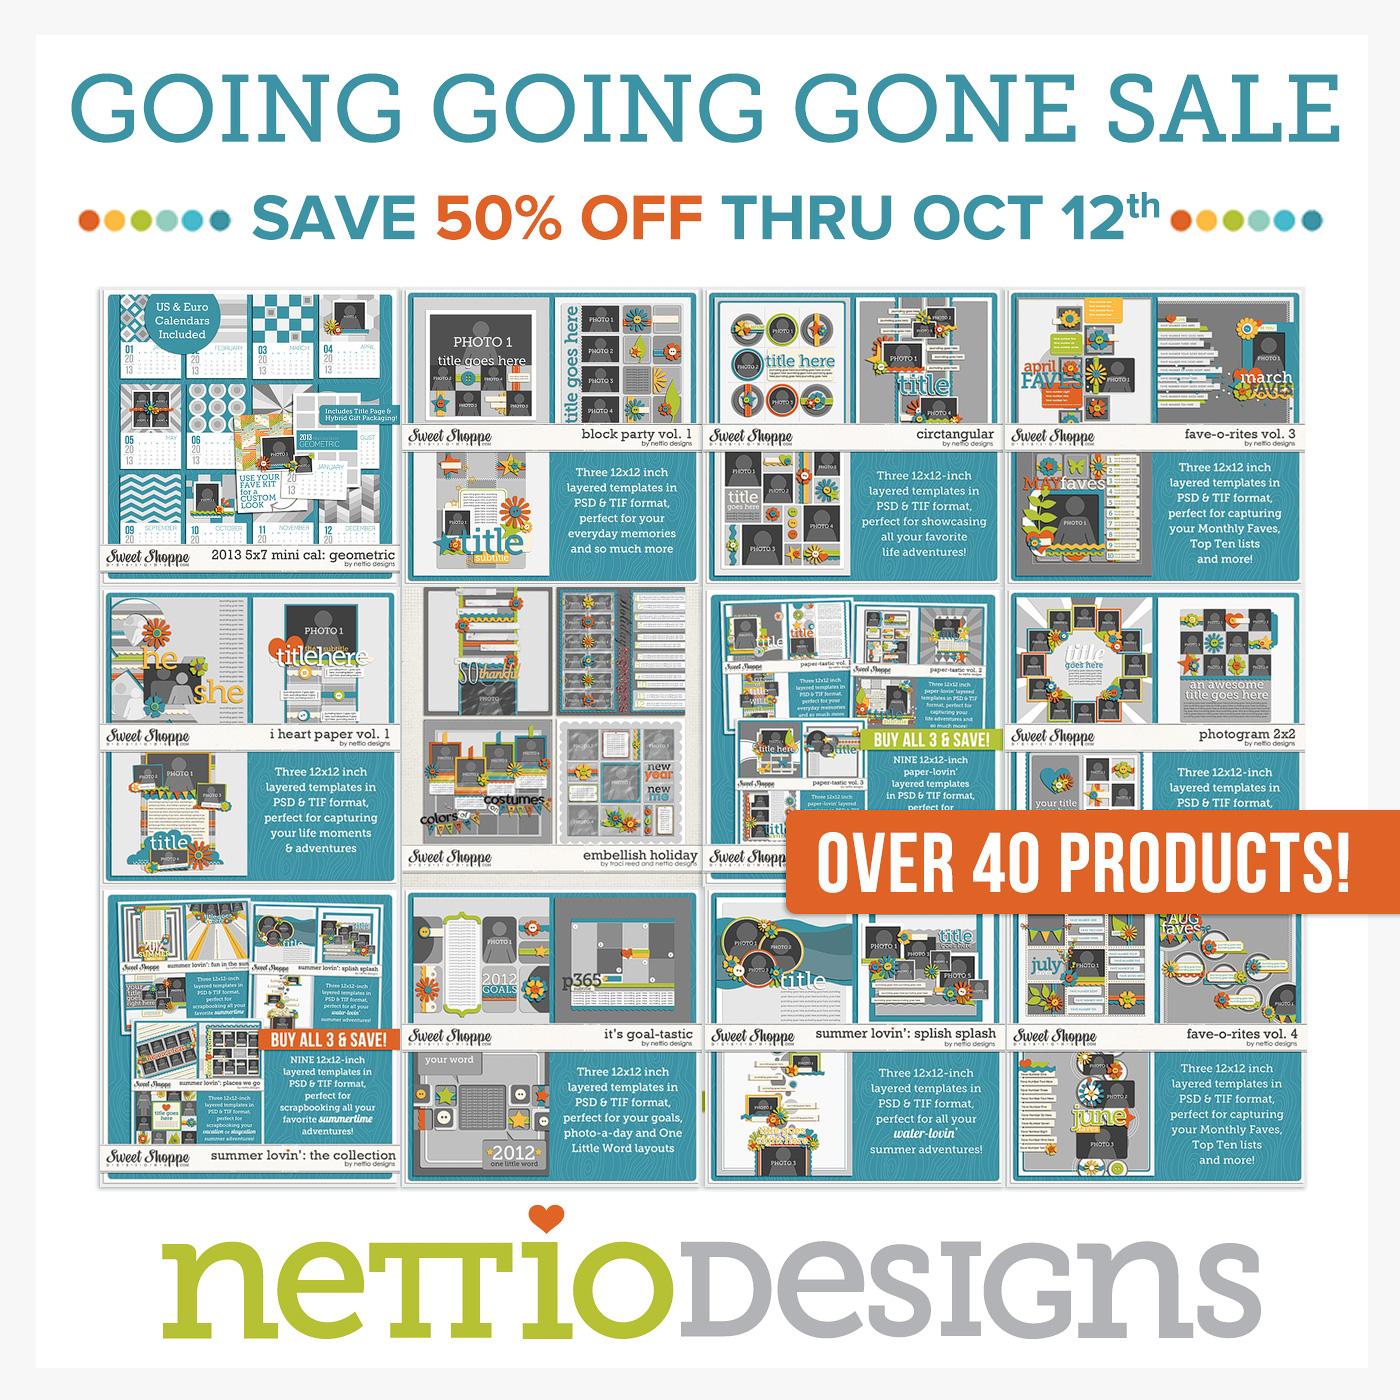 nettiodesigns_ggg2013-1400